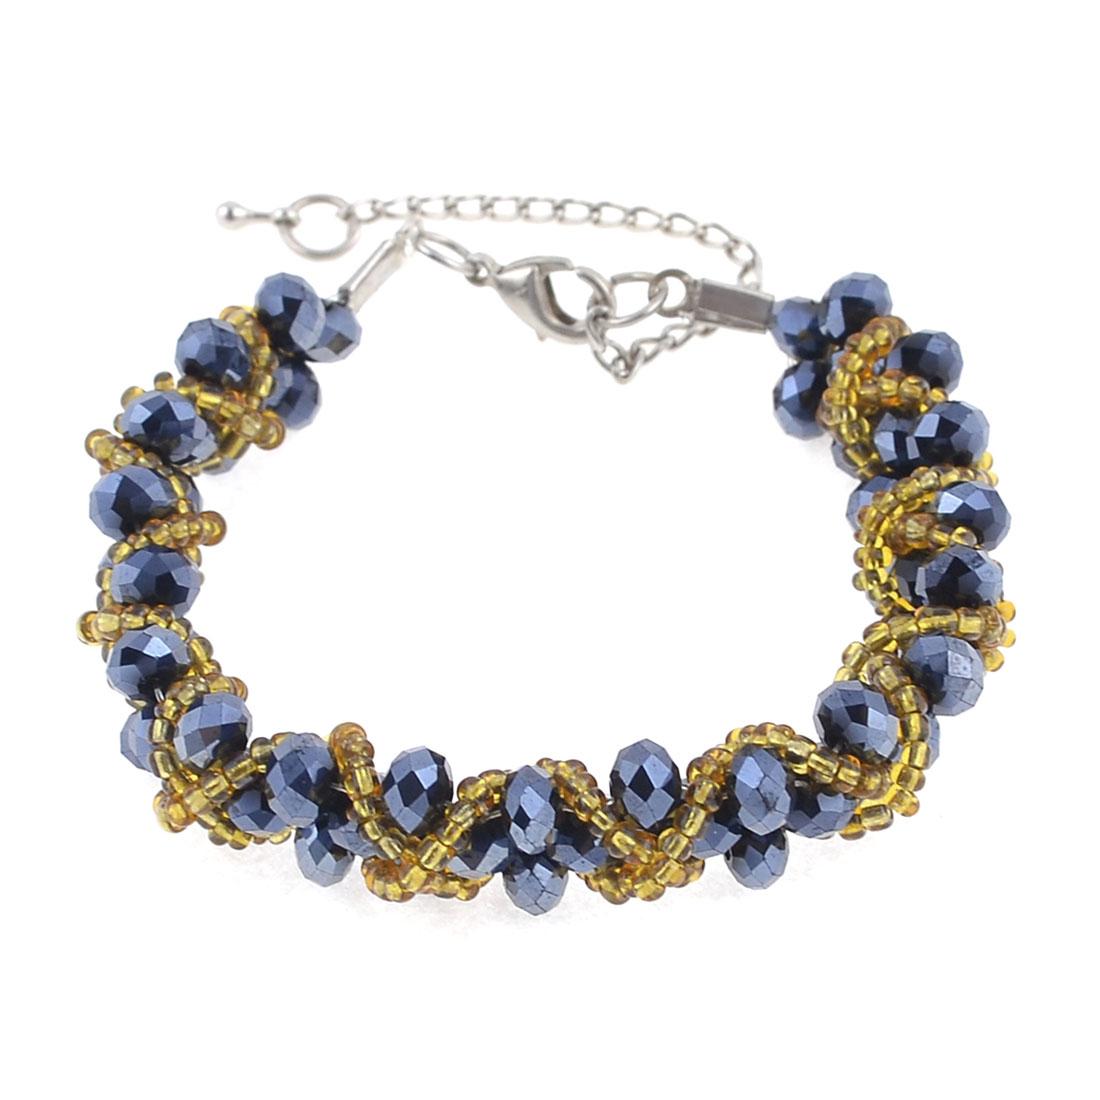 Lady Blue Gold Tone Plastic Crystal Adjustable Braided Link Bracelet Gift